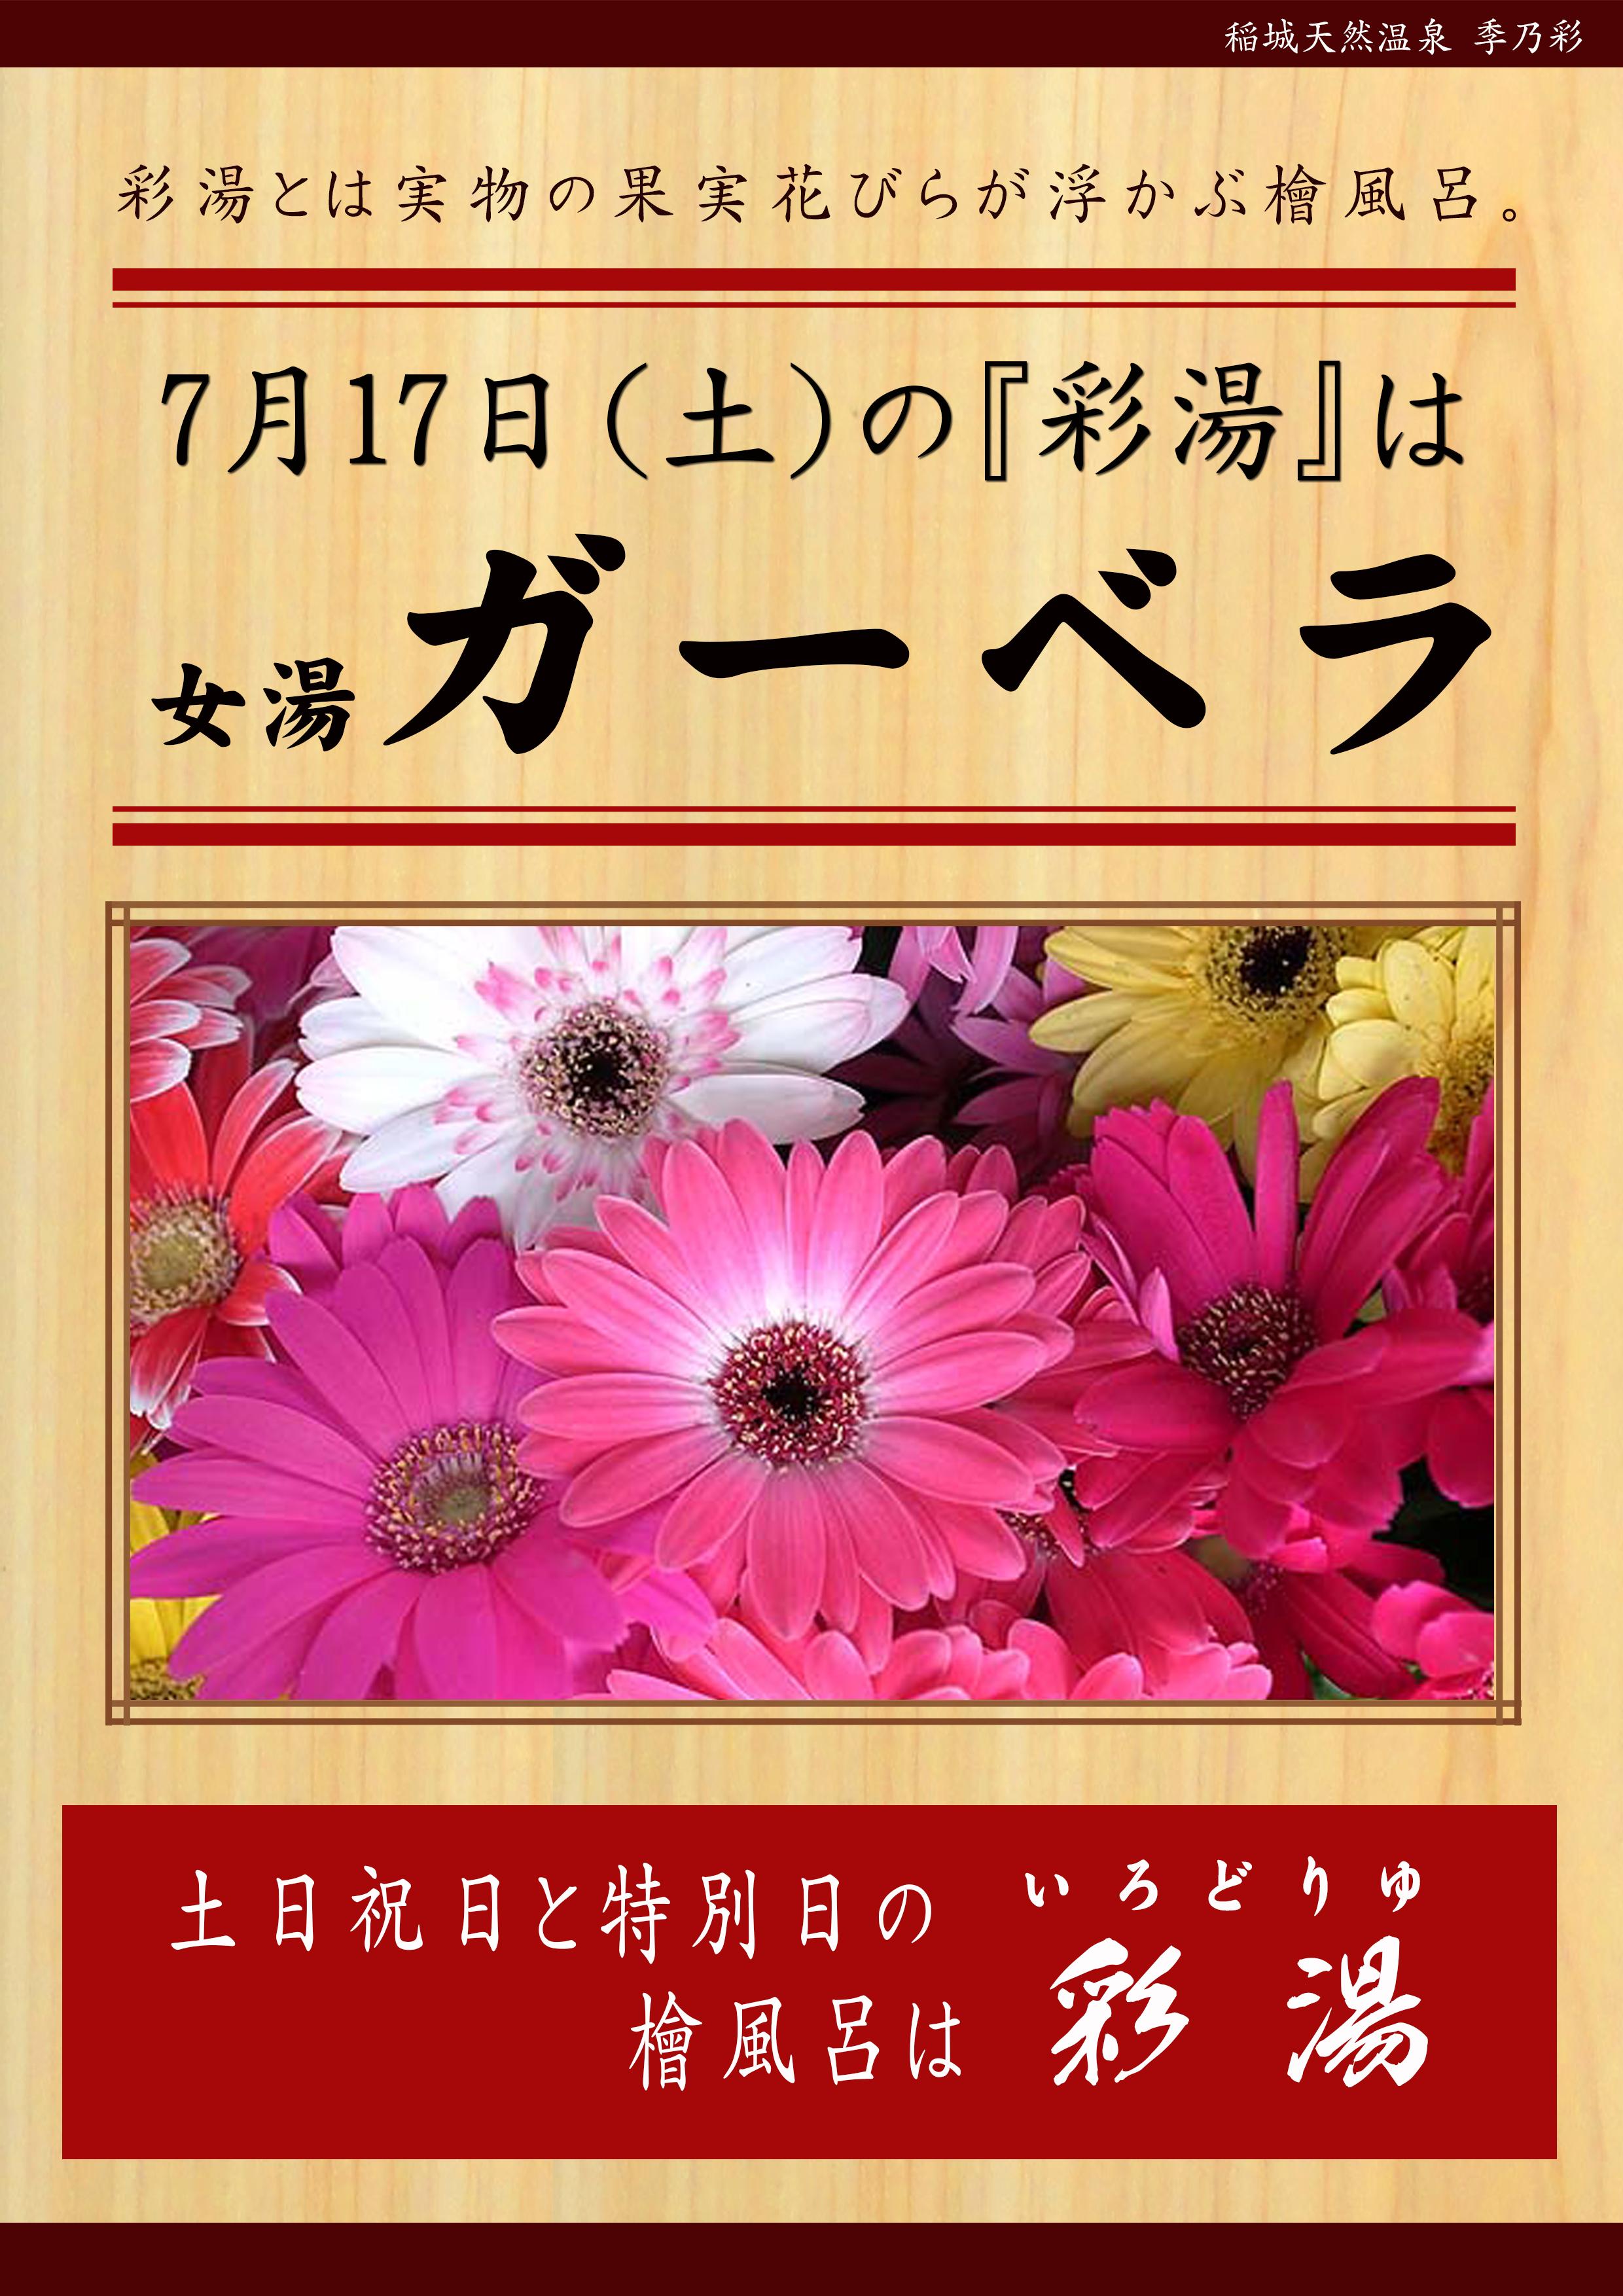 20210717 POP イベント 彩湯 女湯 ガーベラ